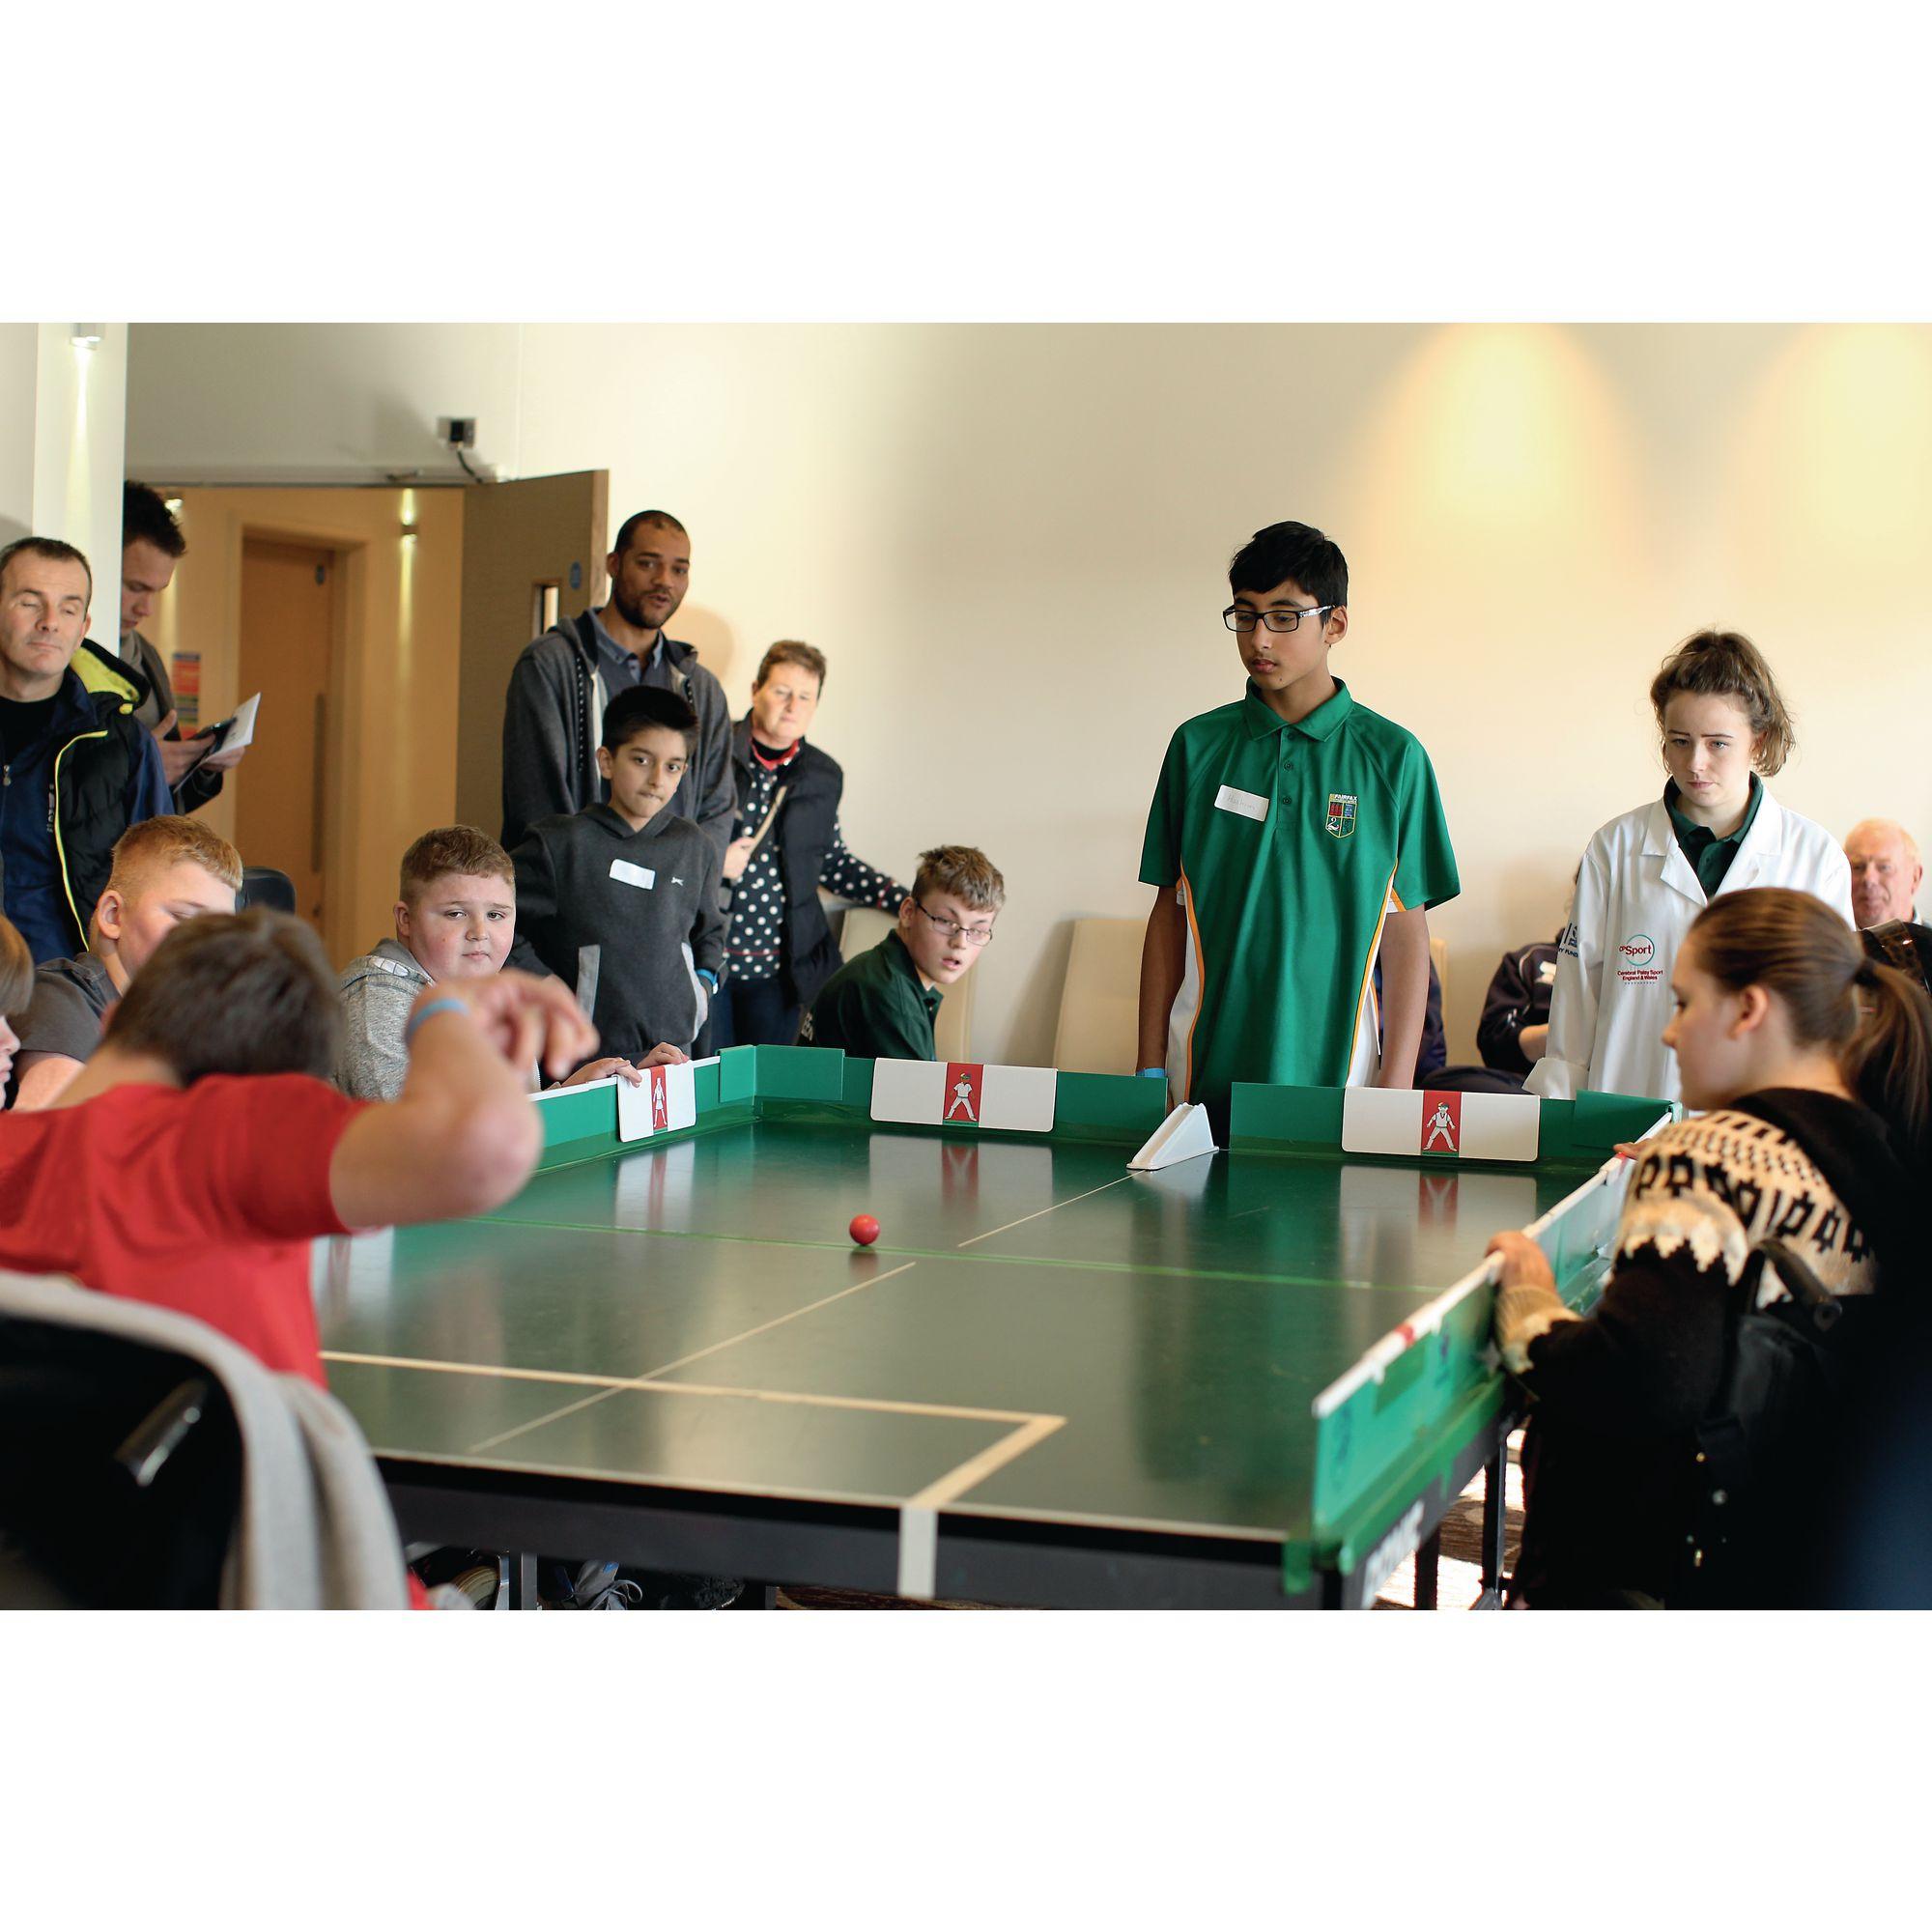 Table Top Cricket Set  sc 1 st  Davies Sports & Table Top Cricket Set | Davies Sports